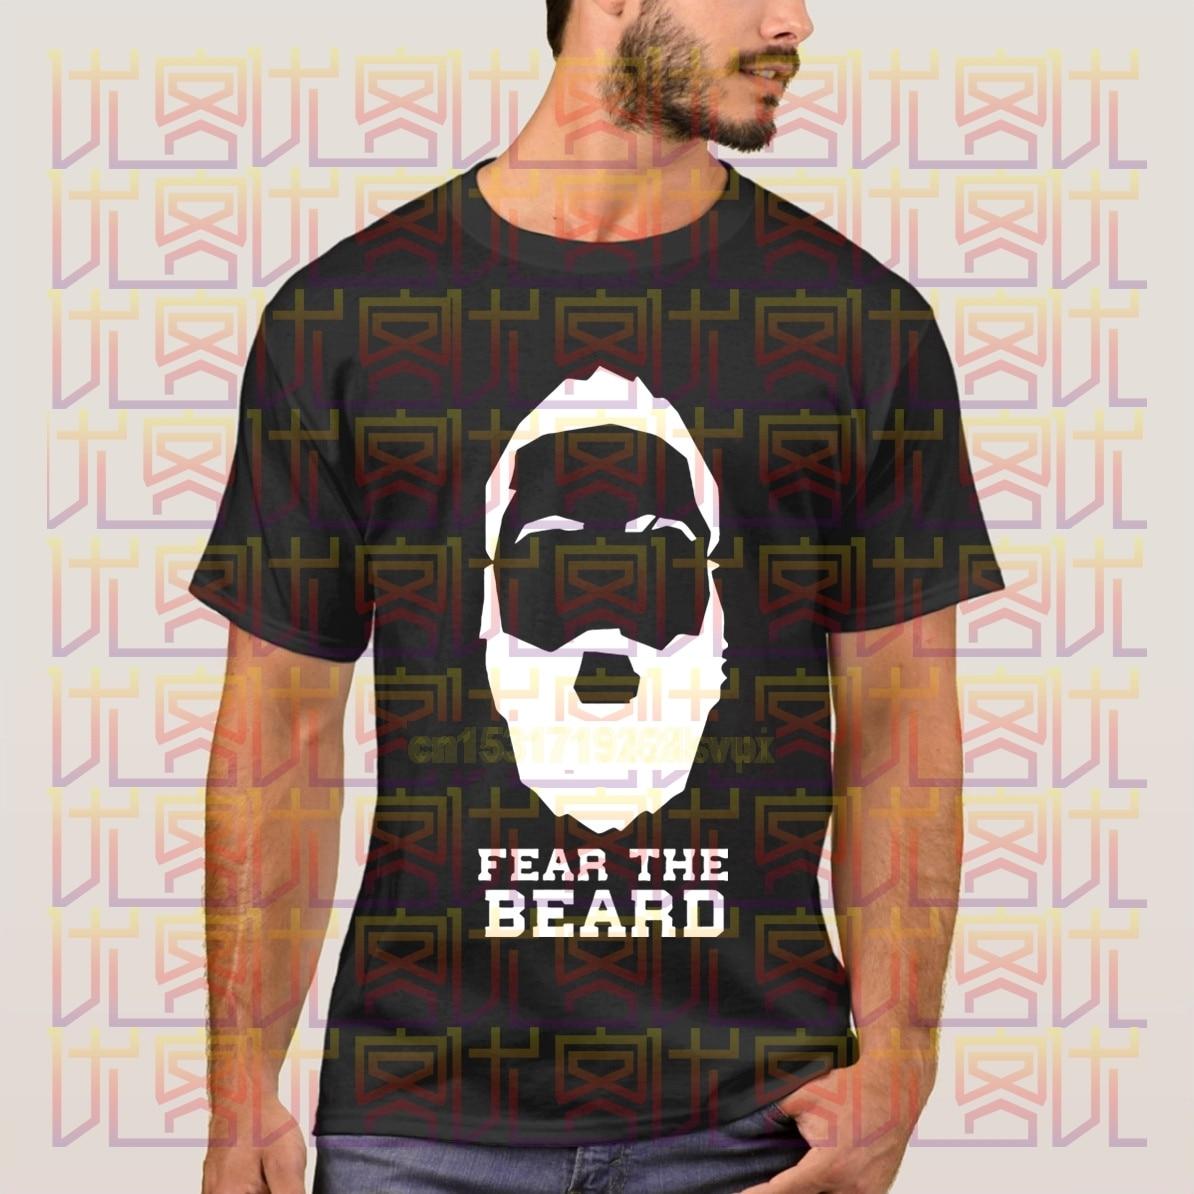 2020 moda Tide Camiseta James Harden Fear the beard Camisetas estampadas Arizona state verano casual camisetas Marca Ropa